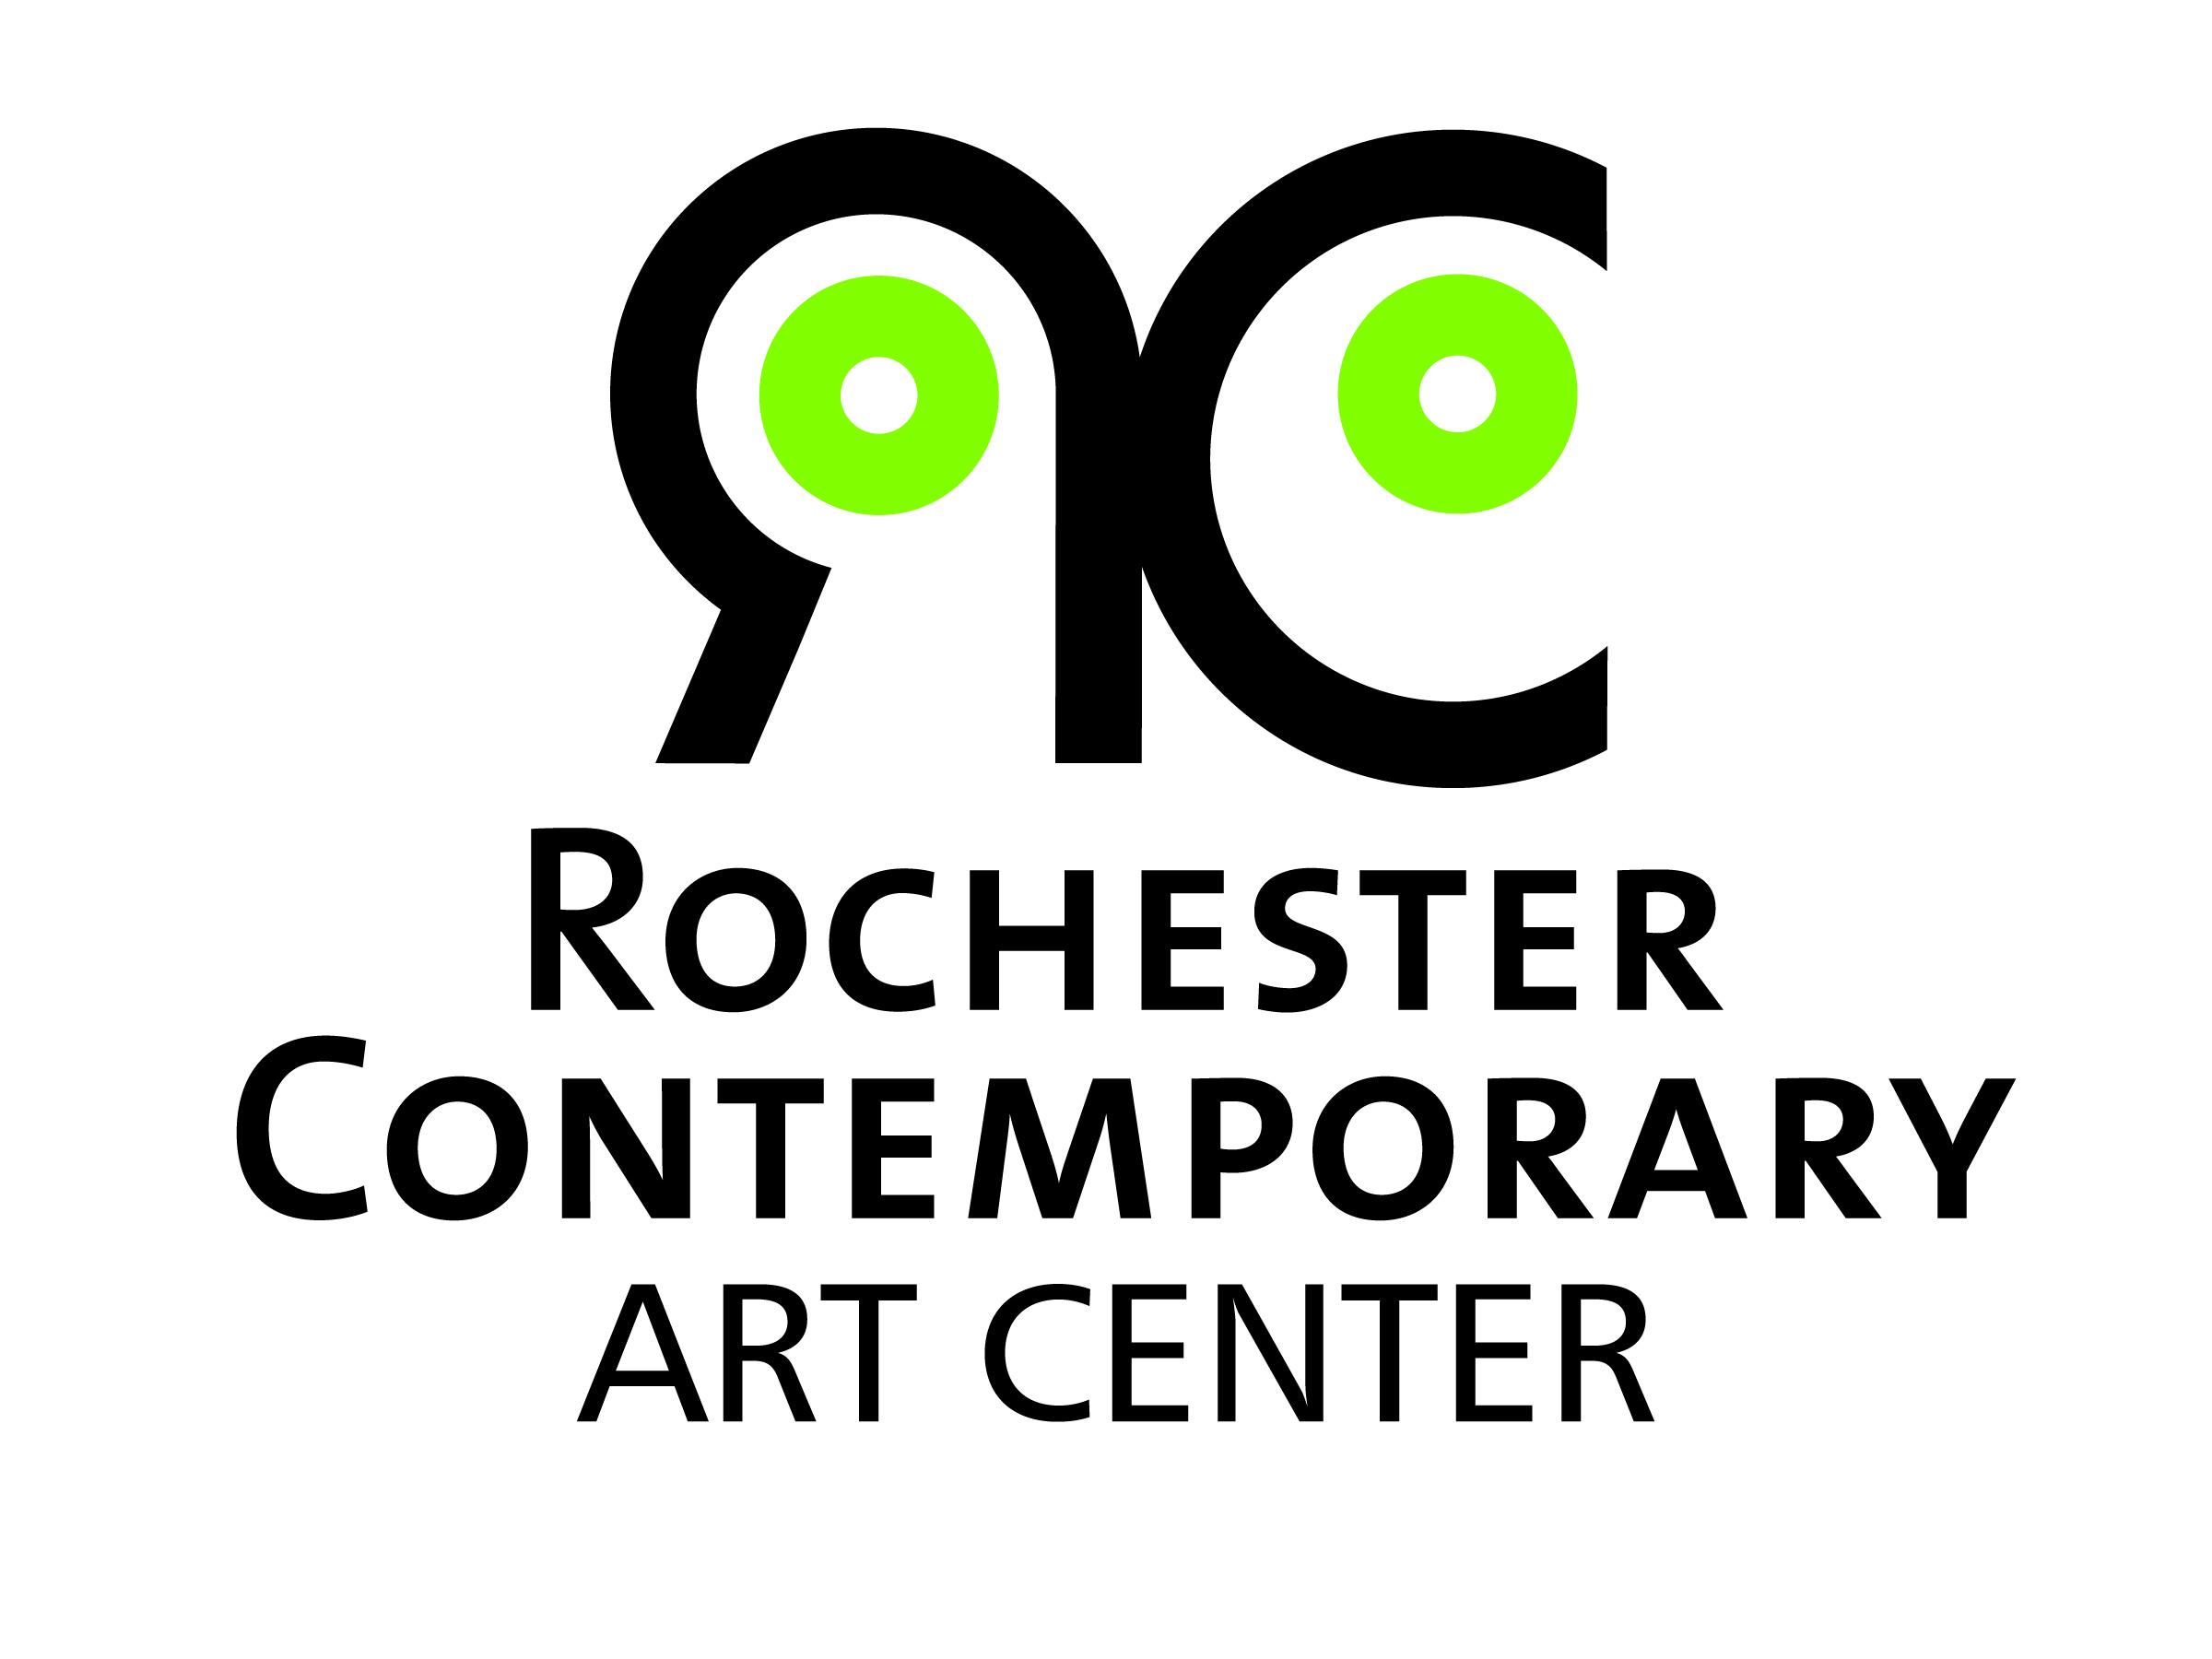 Rochester Contemporary Art Center